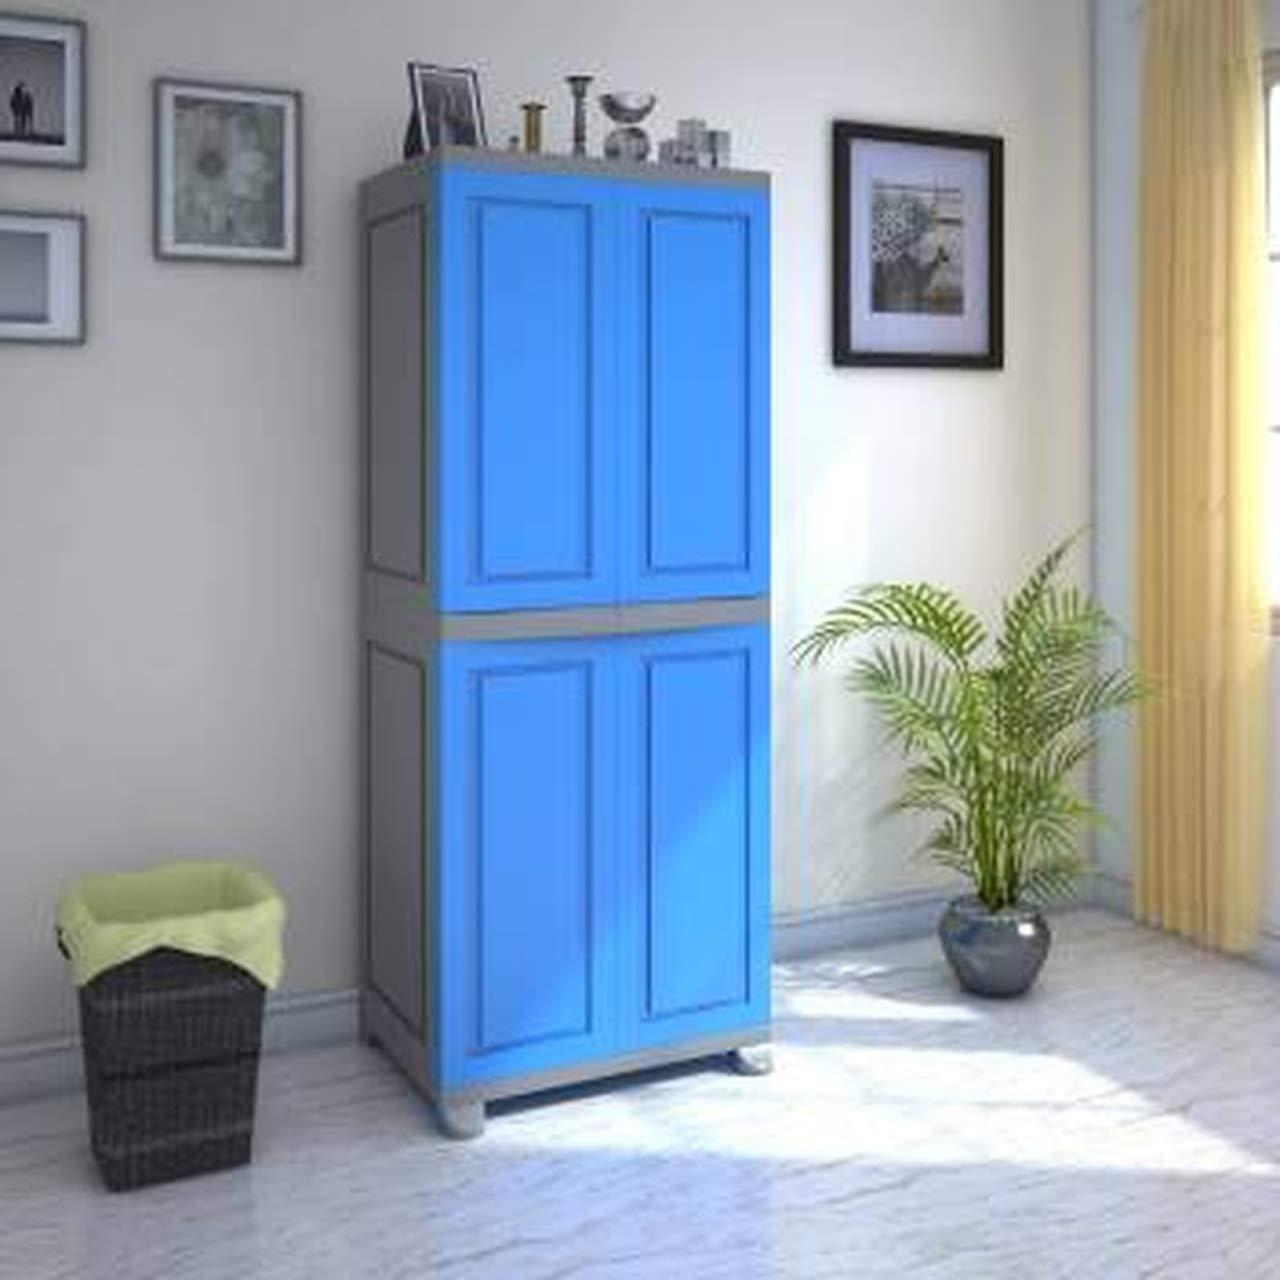 Nilkamal Freedom Big 1 Fb 1 Plastic Storage Cabinet Deep Blue Grey Amazon In Home Kitchen